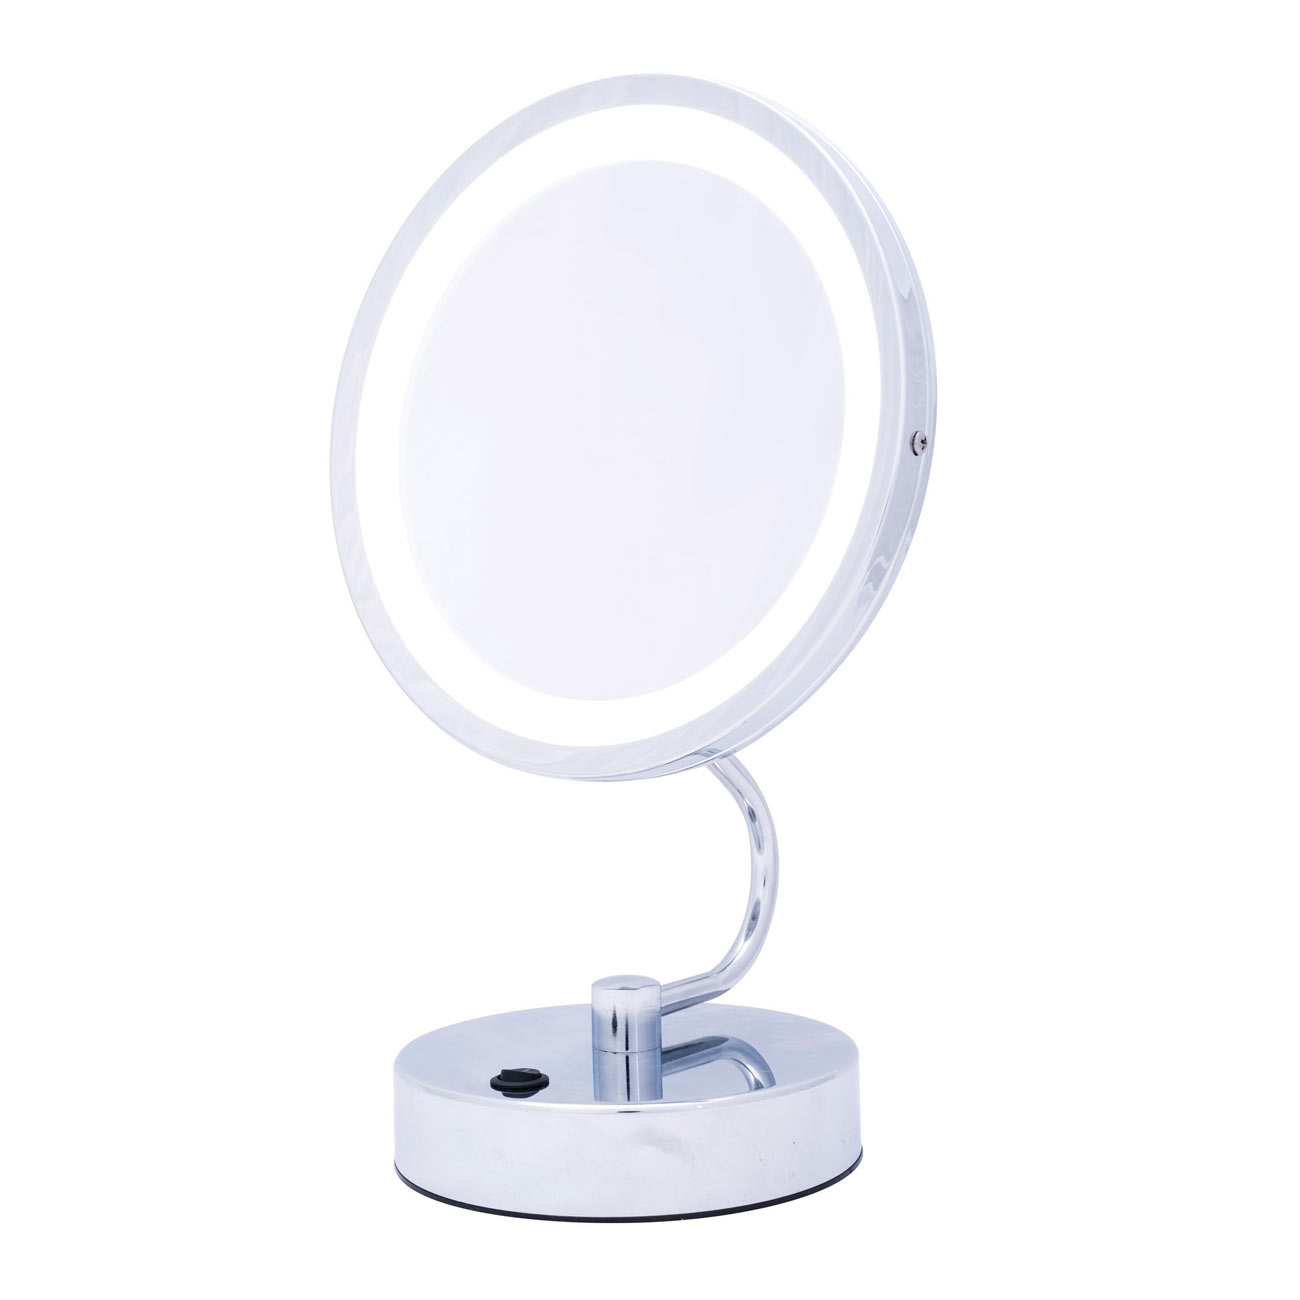 Danielle Foldaway LED Mirror - Chrome 10x